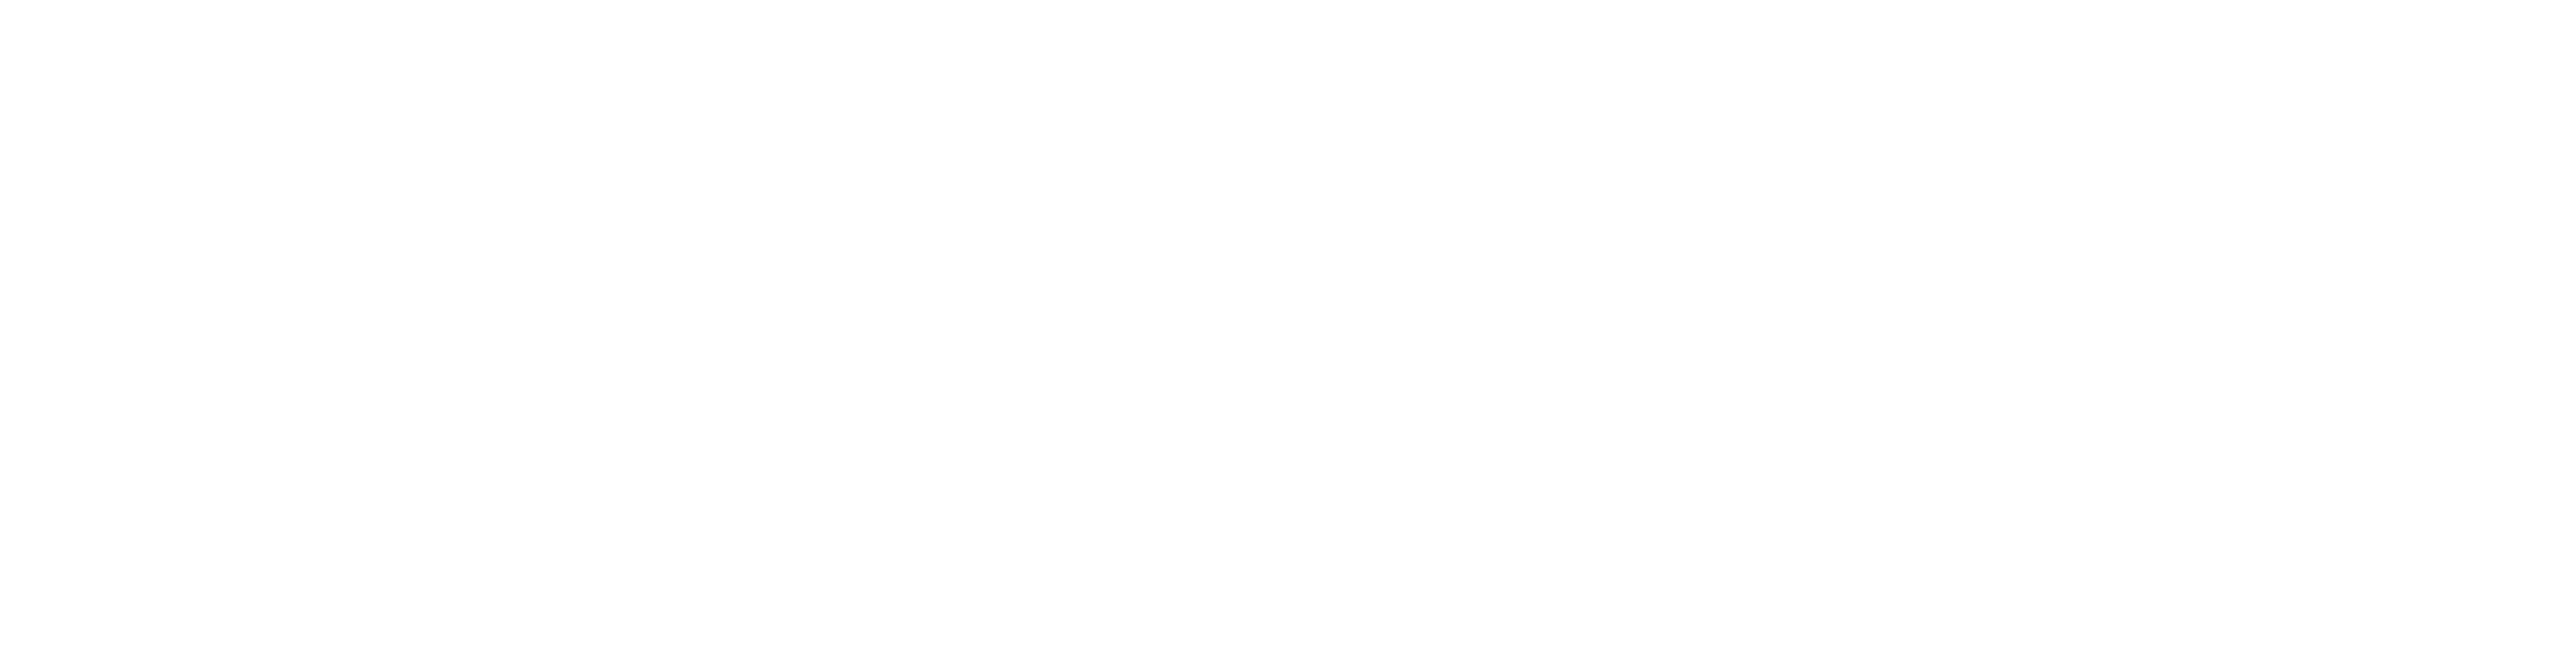 HaloShare